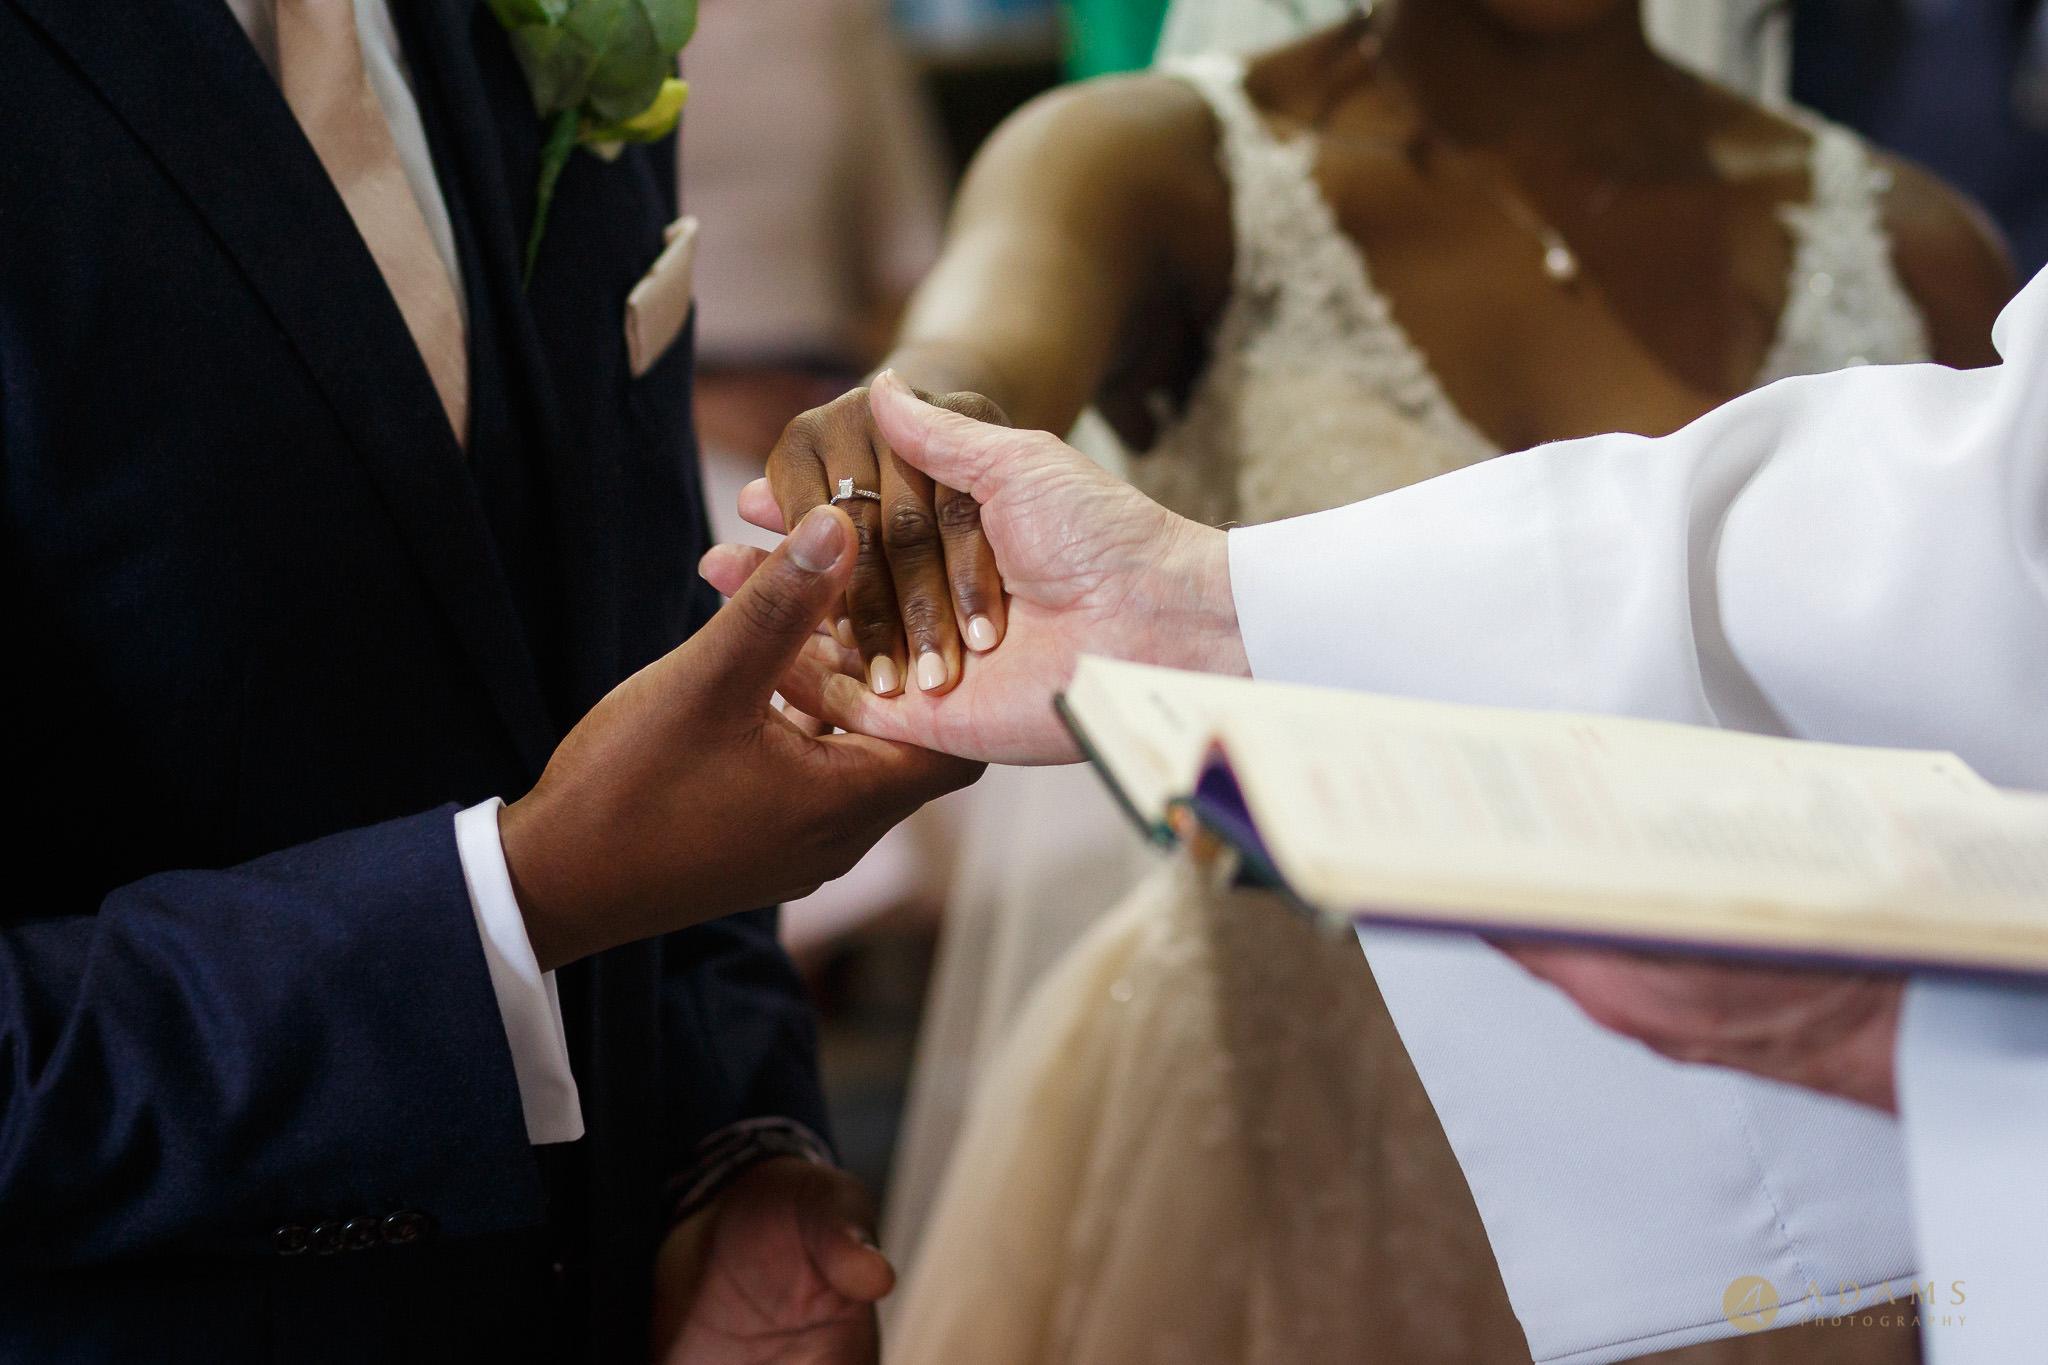 handshake of the bride and groom